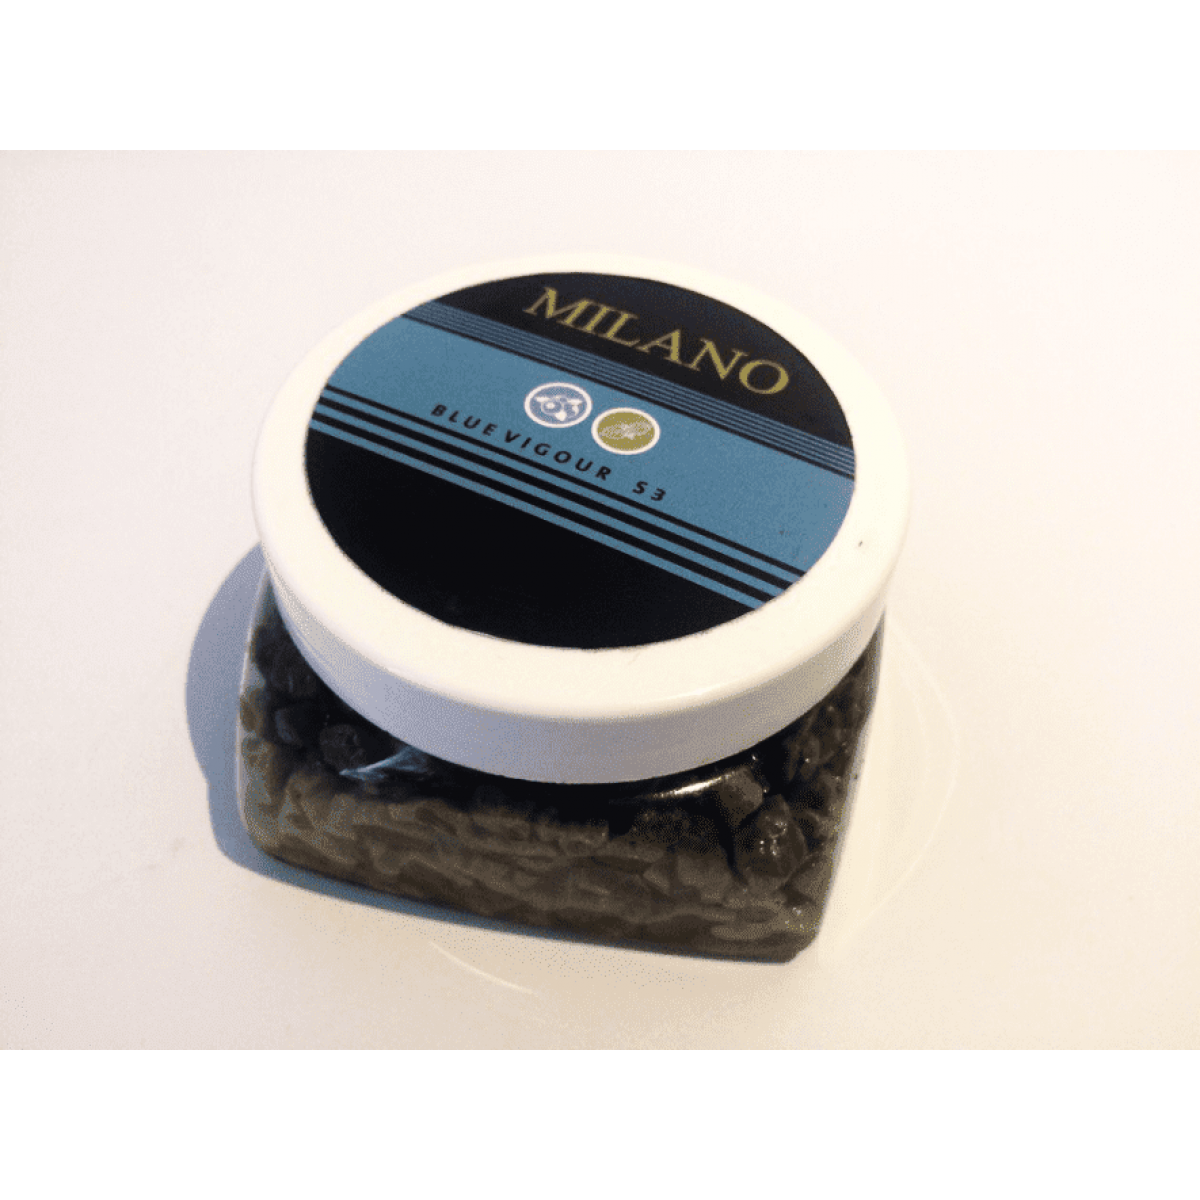 Курительные камни Milano Stones Blue Vigour (Милано Стонс Голубика) 120 грамм